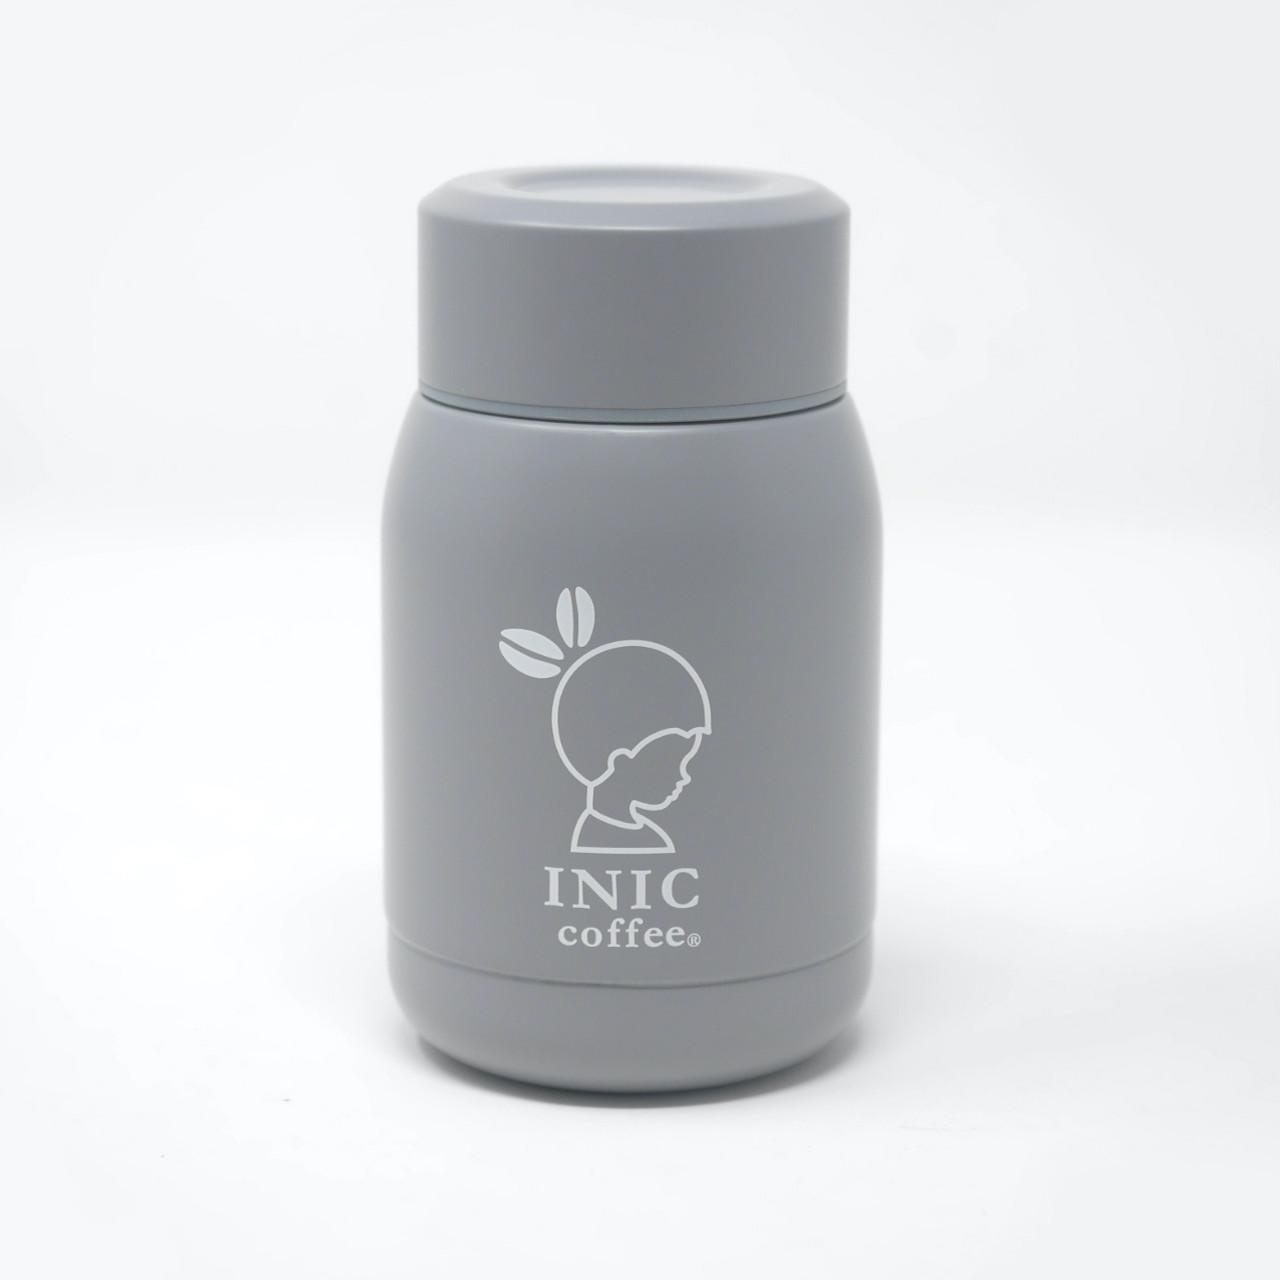 INIC×カフア ステンレスボトル グレー